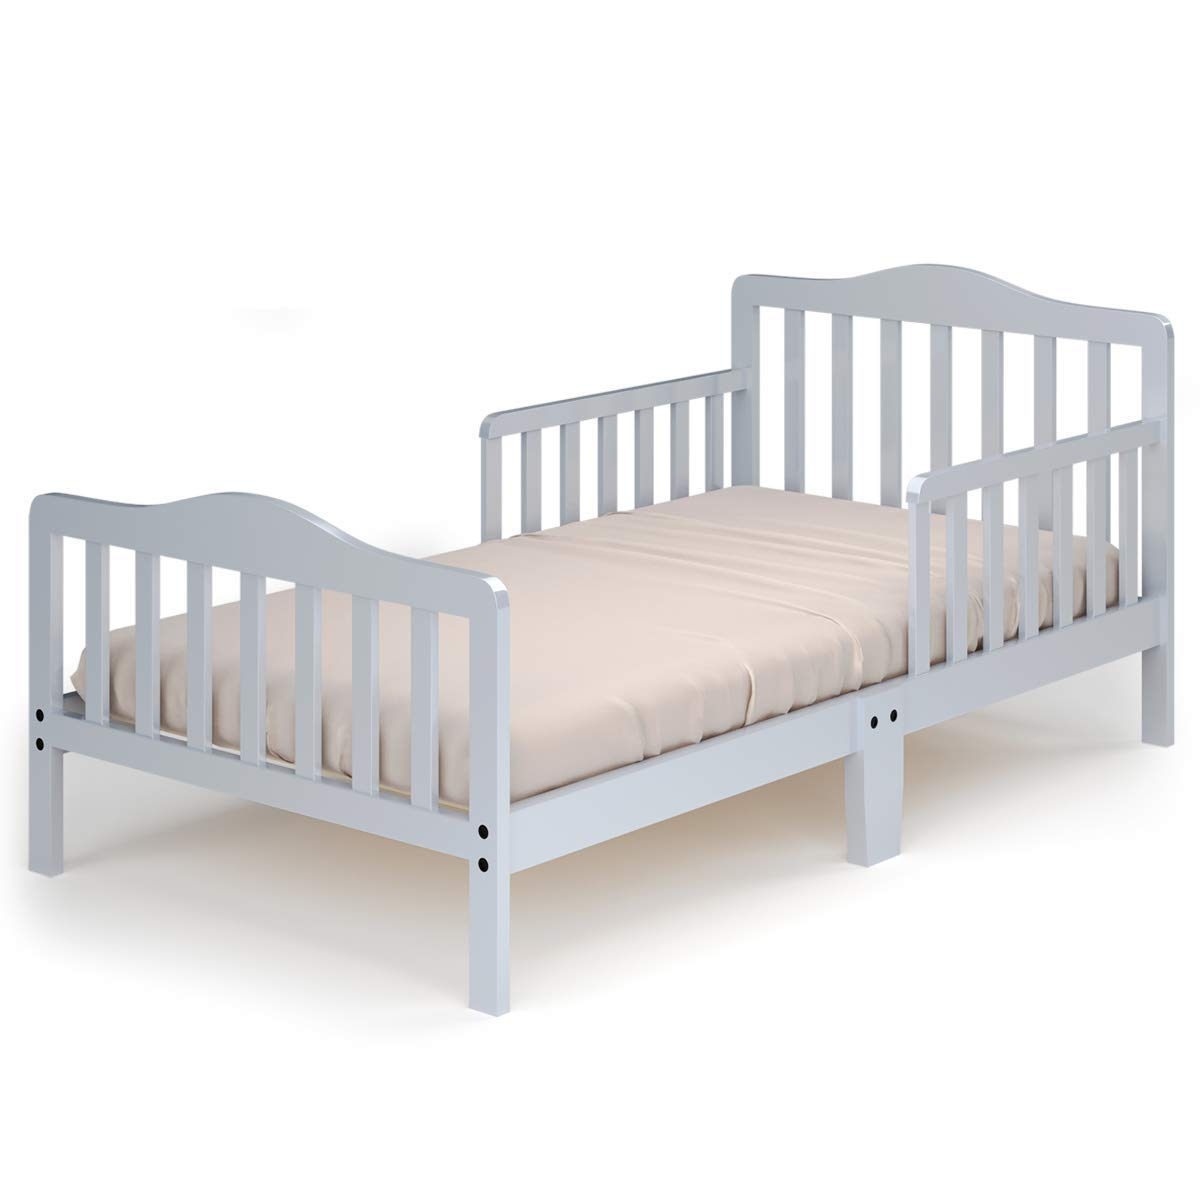 Costzon Toddler Bed, Classic Design Wood Bed Frame w/Two Side Safety Guardrails & Wooden Slat Support for Kids Boys & Girls, Children Sleeping Bedroom Furniture (Gray)